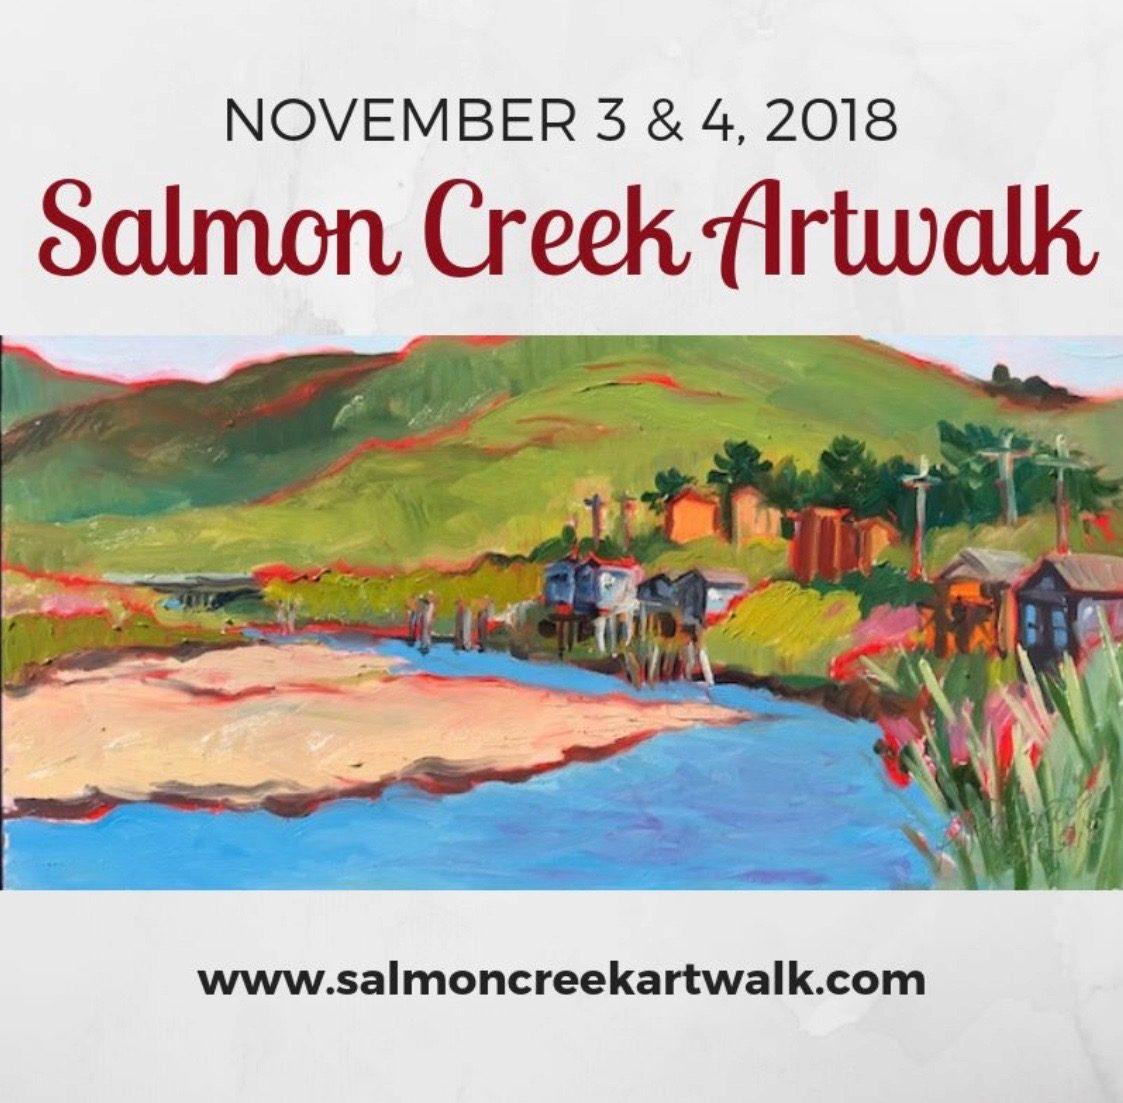 Salmon Creek Artwalk - Nov 3 & 4 @ Salmon Creek Artwalk